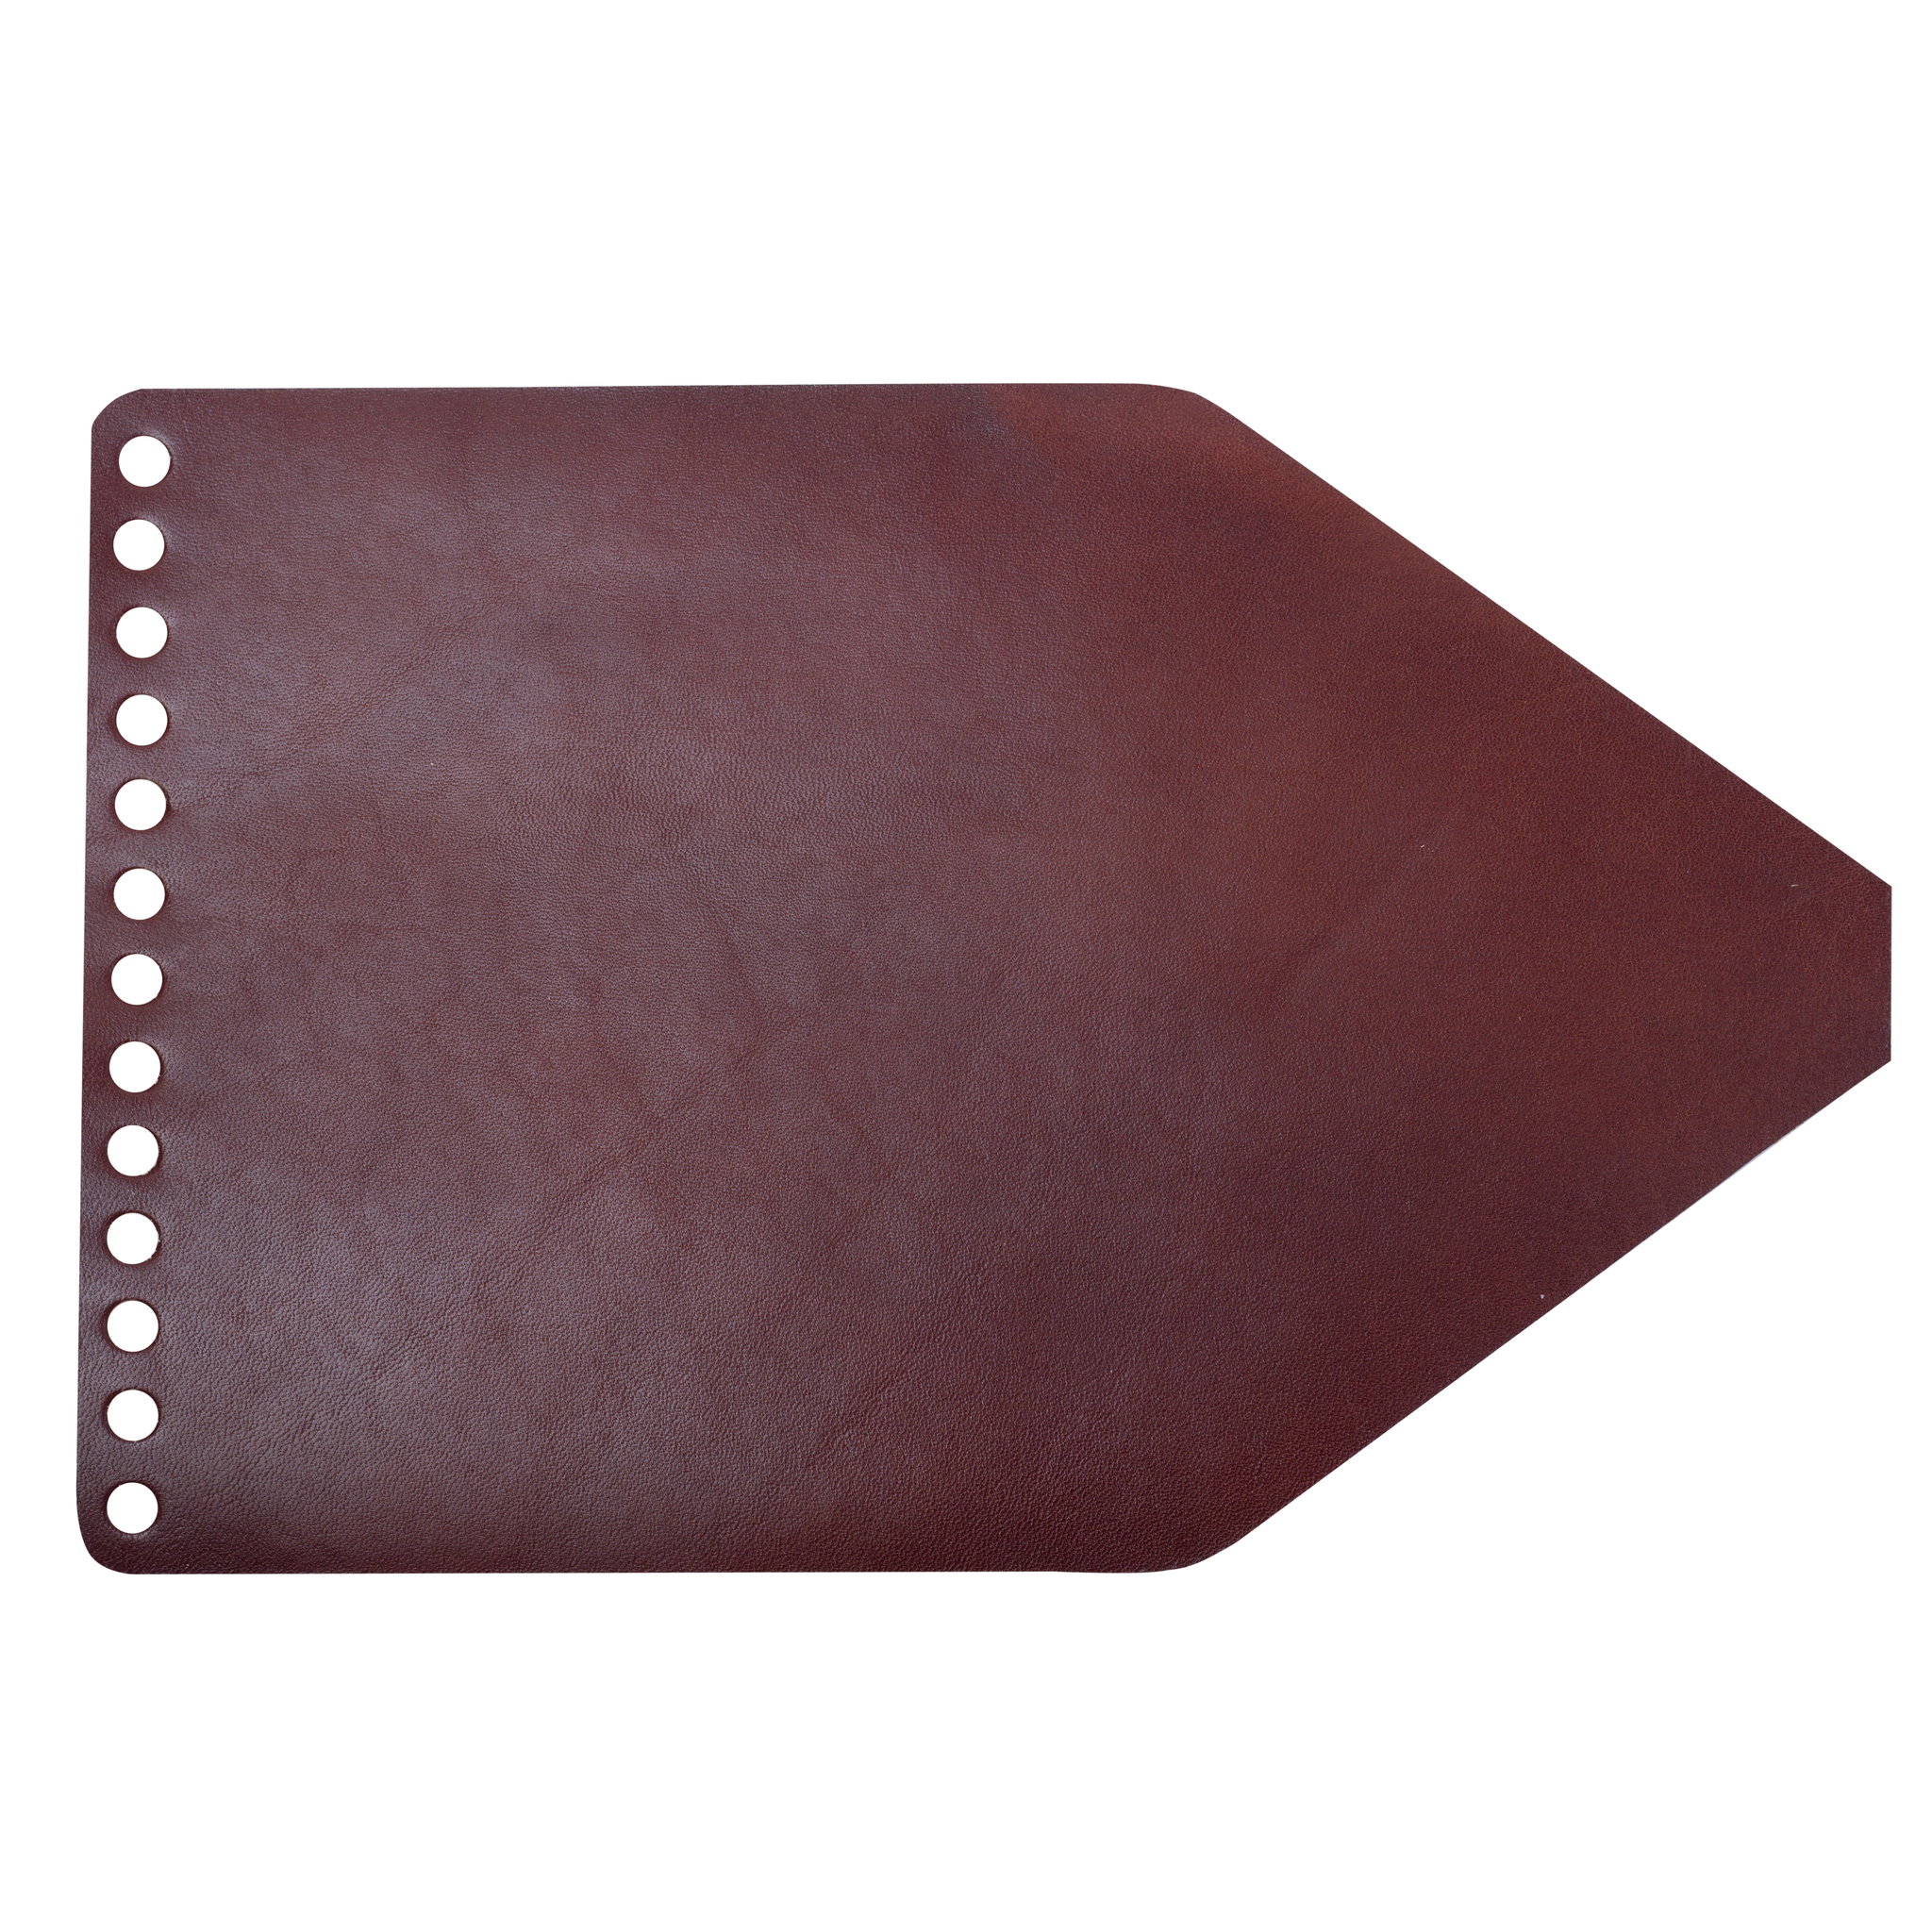 "Кожаная фурнитура Клапан для рюкзачка кожаный ""Вишня лак"" IMG_9594.jpg"